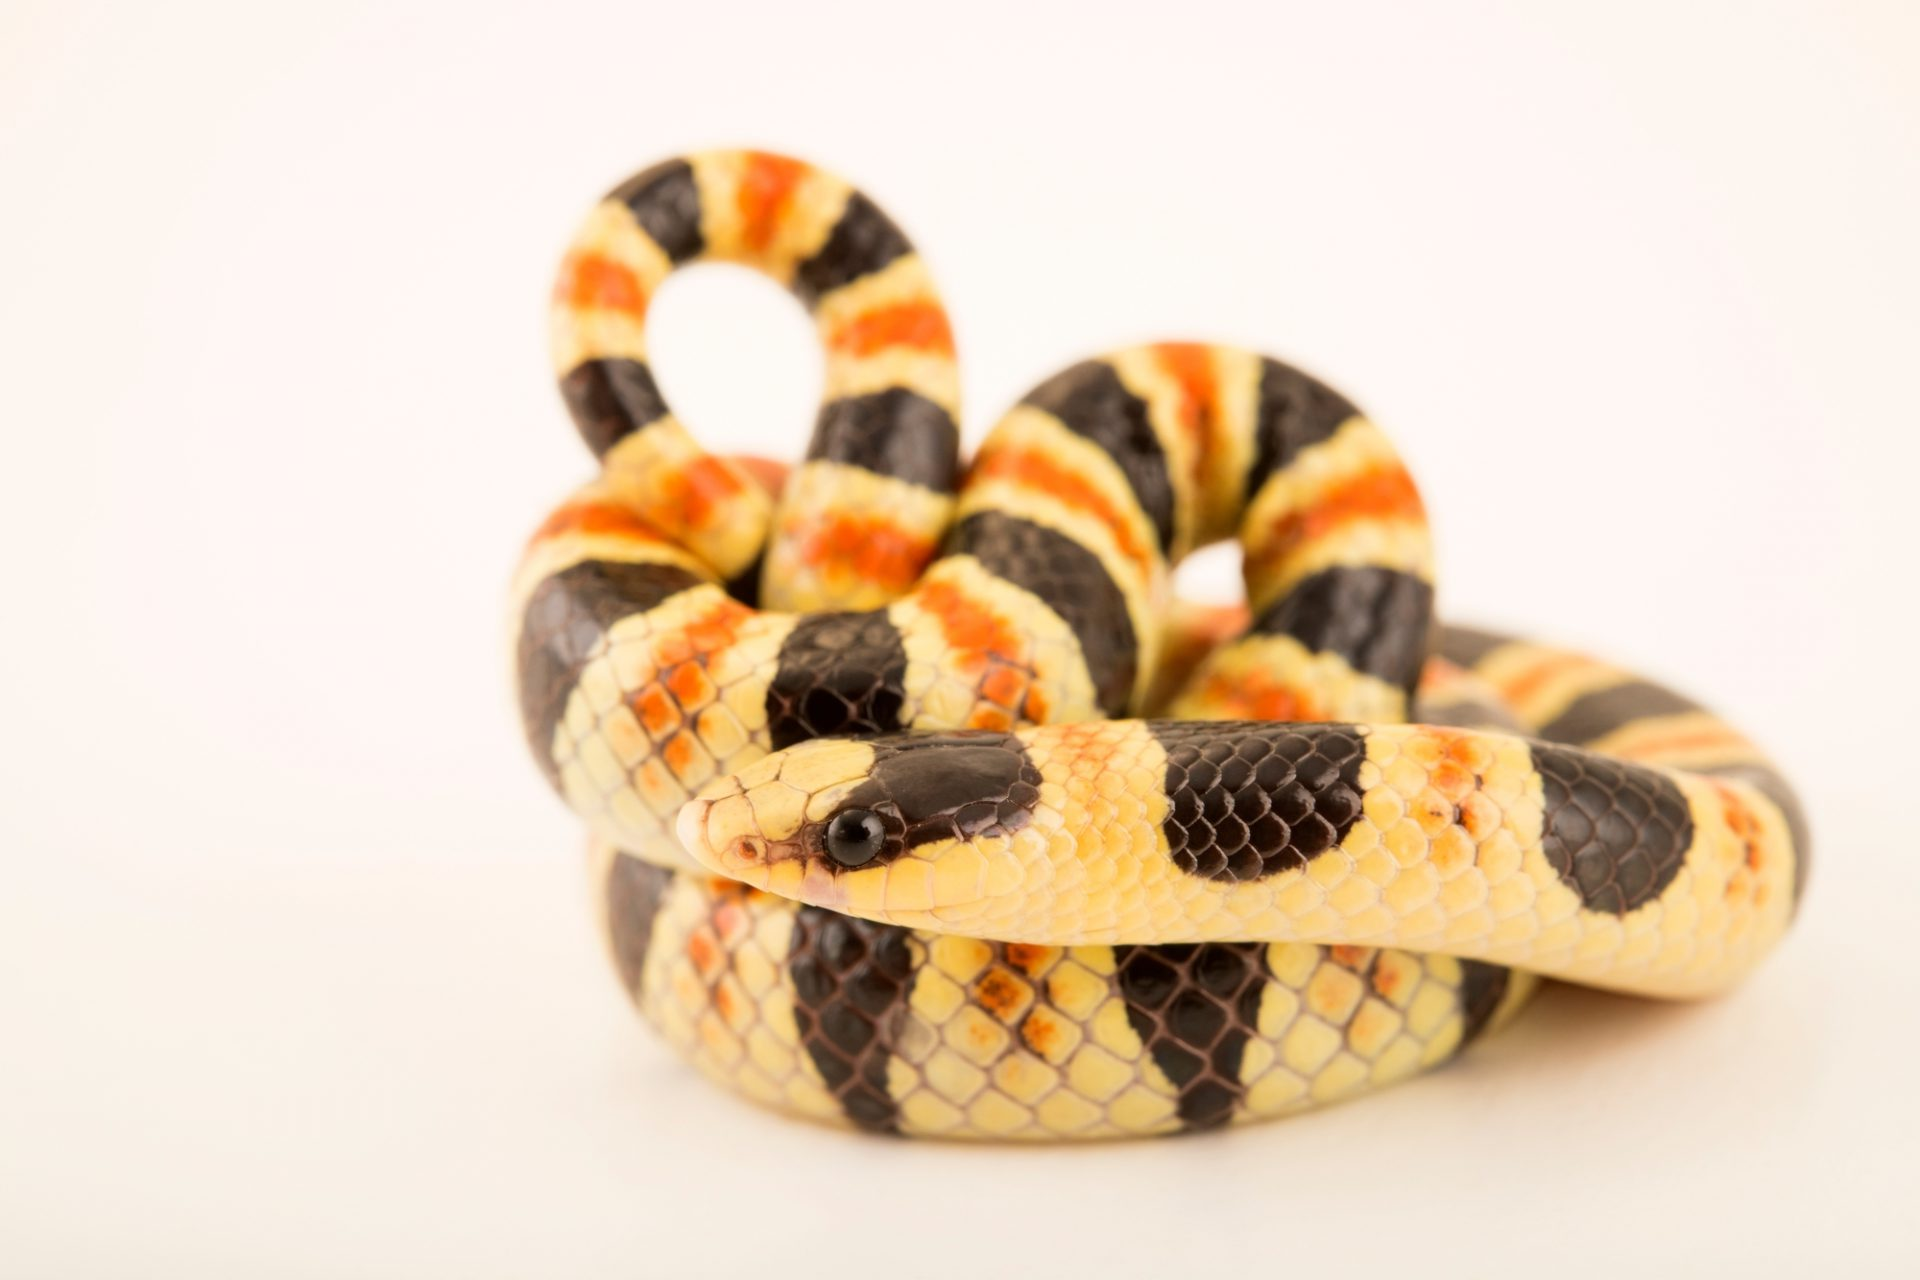 Photo: Colorado desert shovelnose snake, Chionactis occipitalis annulata, at Phoenix Zoo.